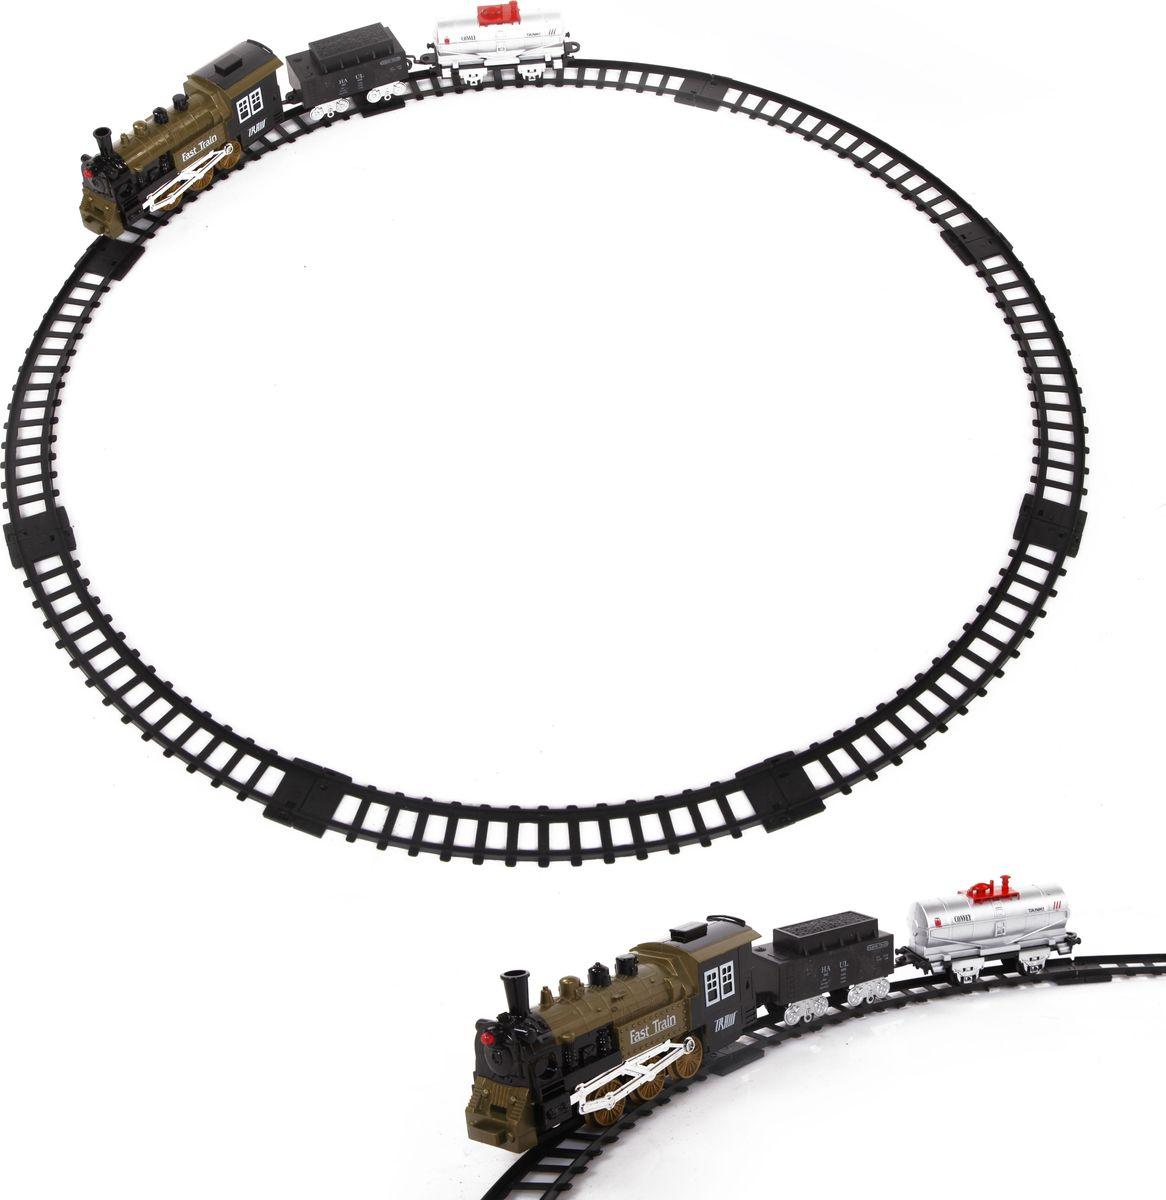 Yako Железная дорога Train And Toy Show Y1699018 - Железные дороги